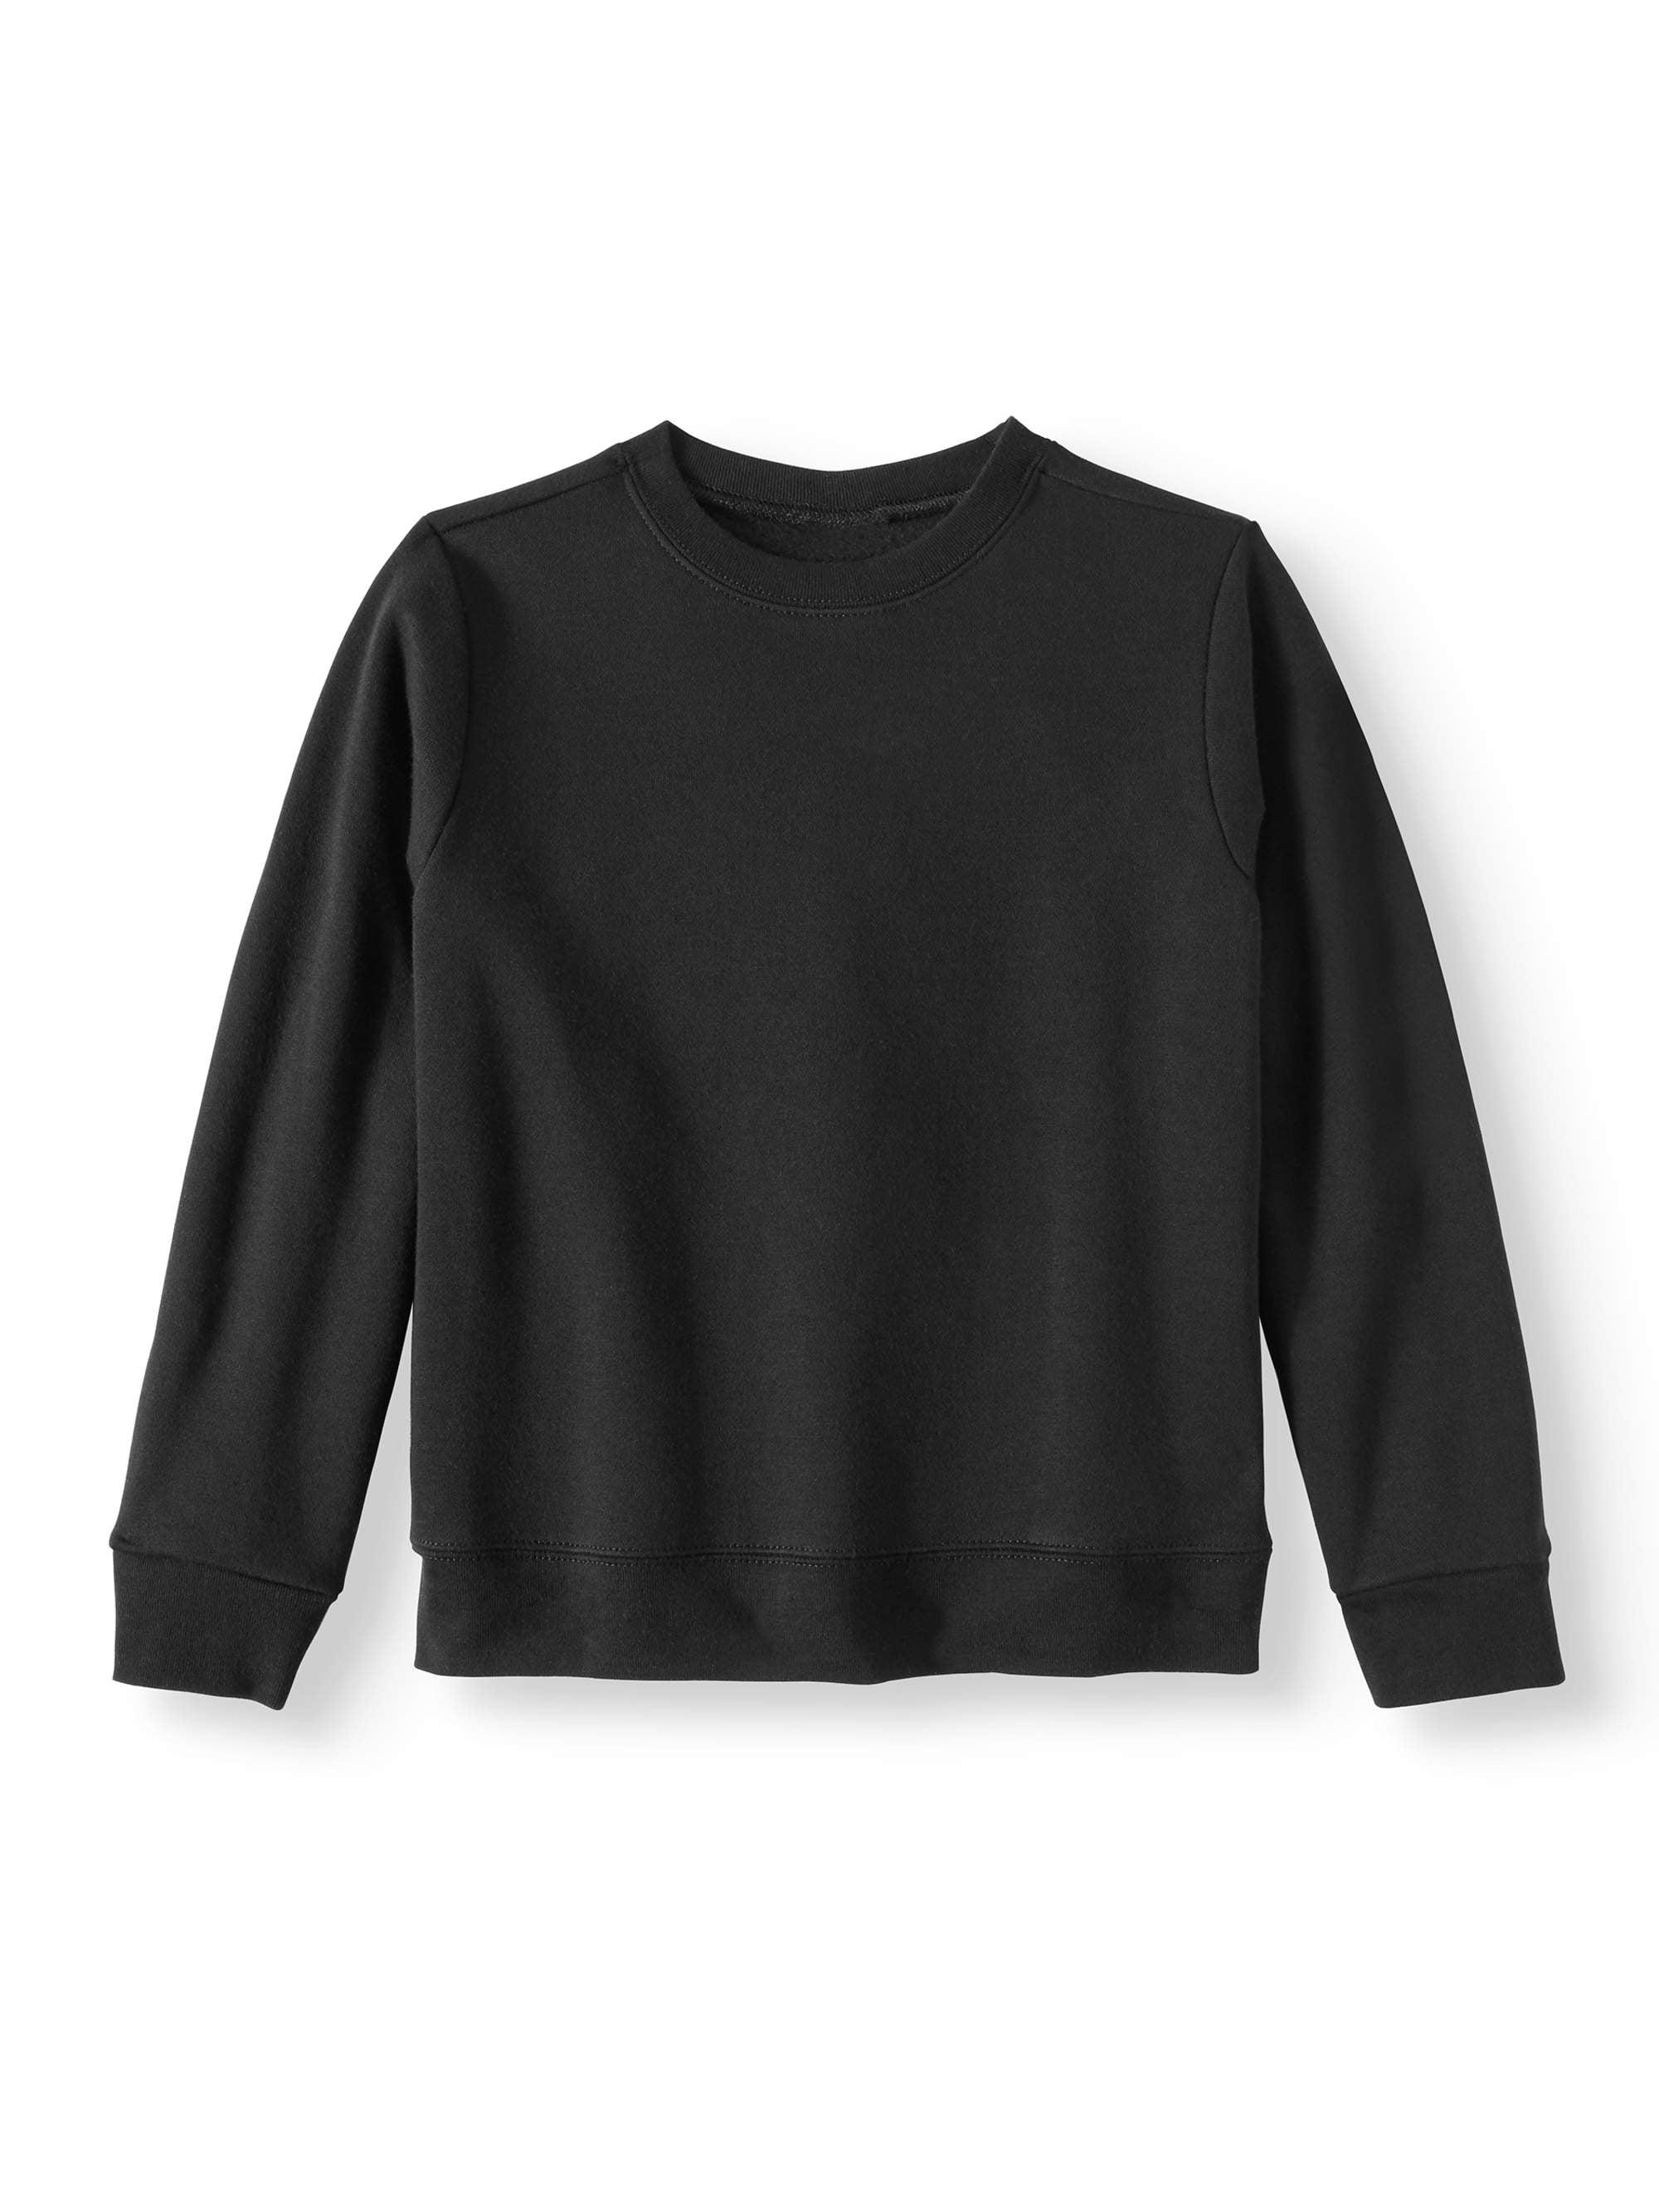 Boys' Pullover Crew Neck Fleece Sweatshirt